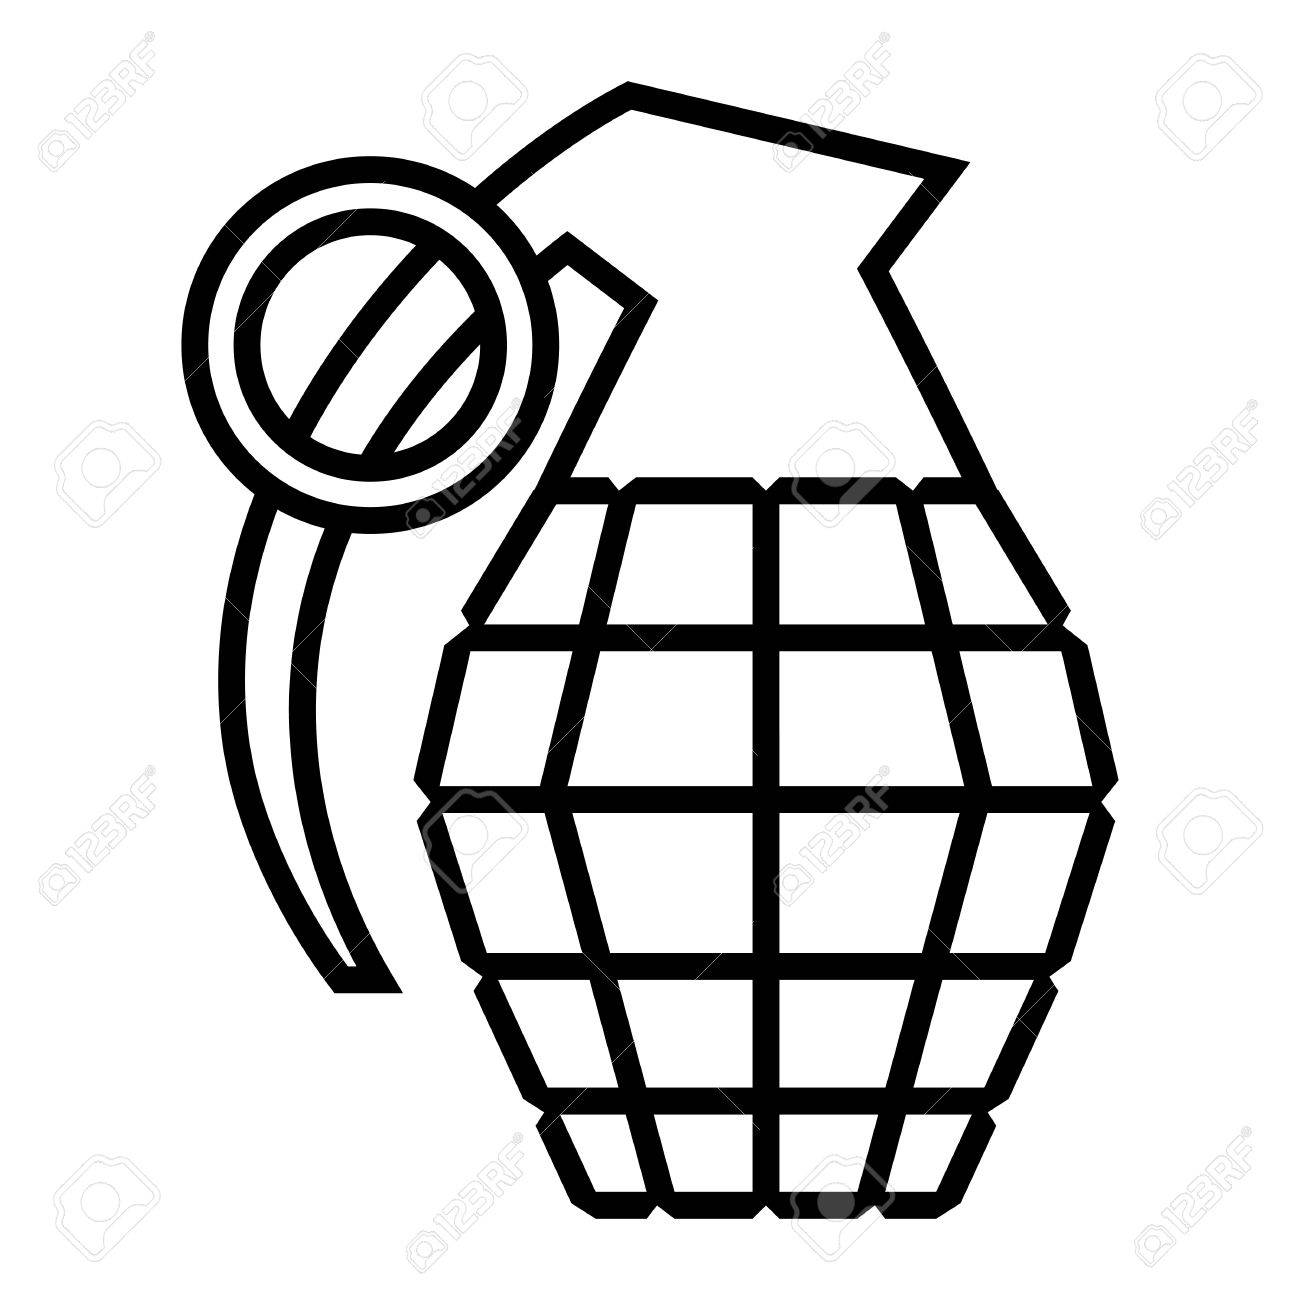 hand grenade vector illustration royalty free cliparts vectors and rh 123rf com